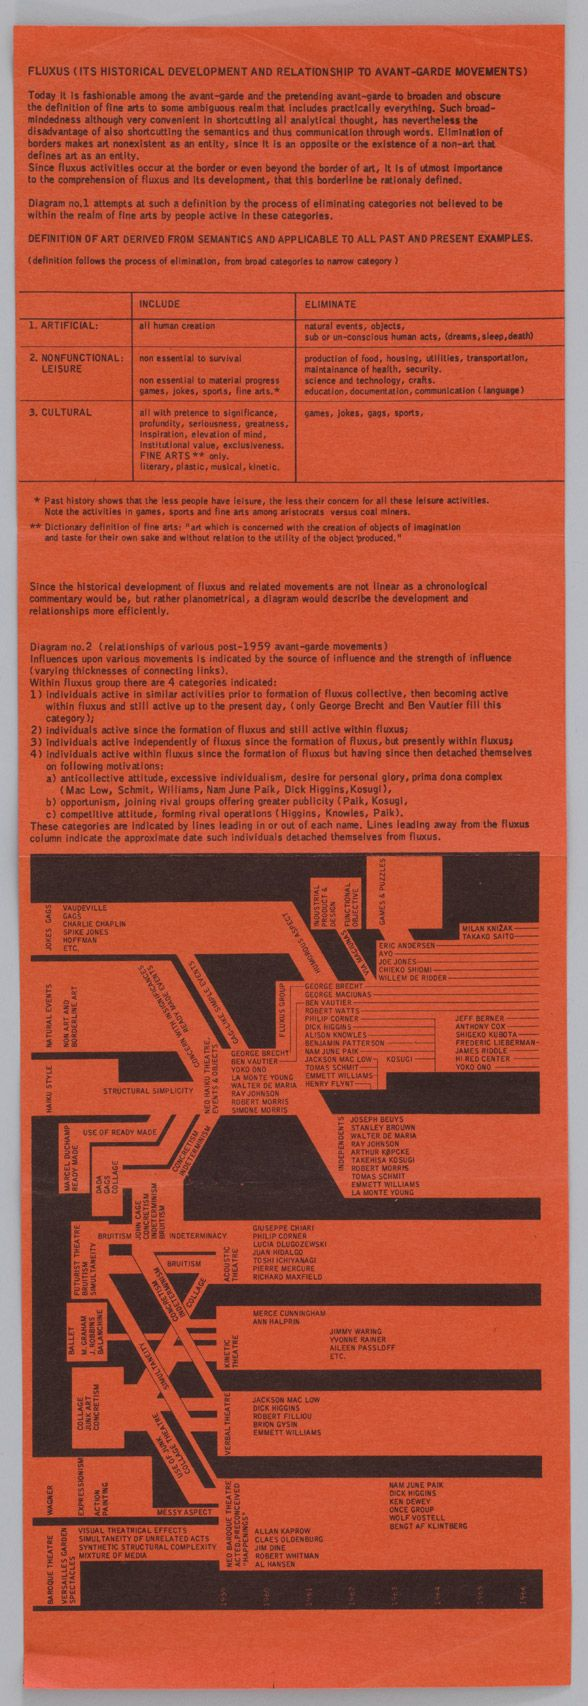 Charting Fluxus: George Maciunas's Ambitious Art History at MoMA | FLUXUS FOUNDATION